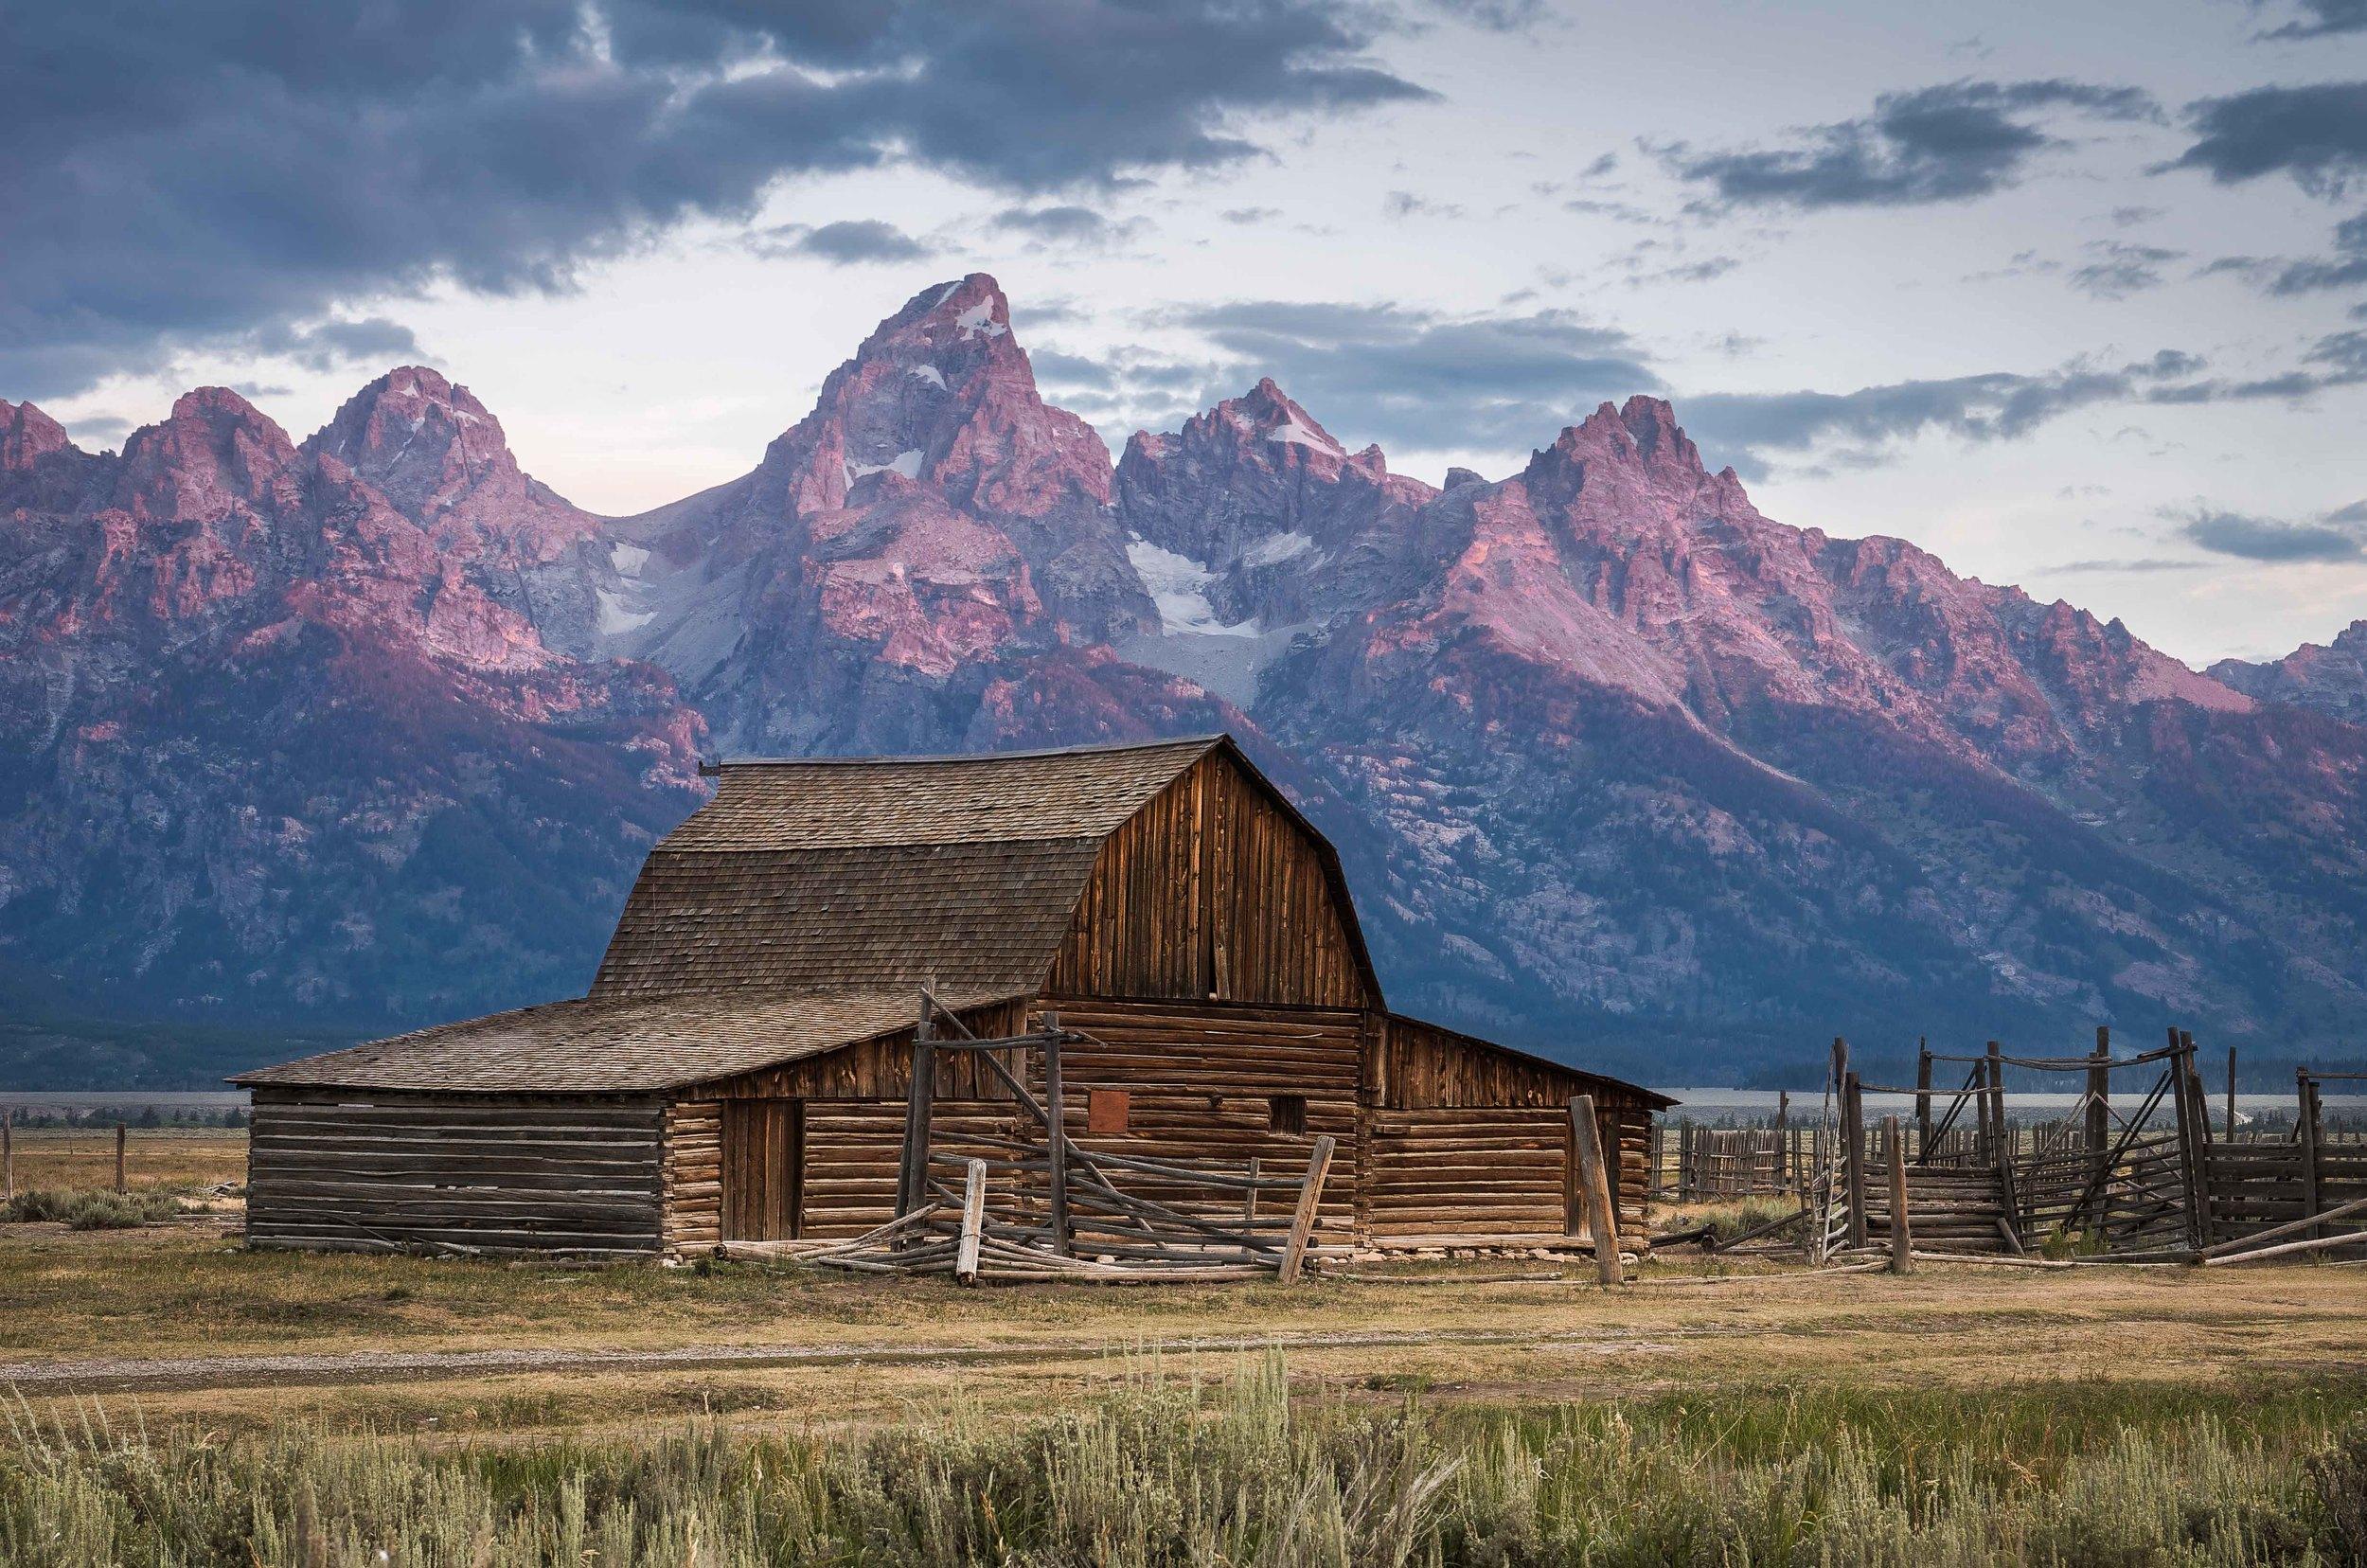 Moulton Barn | Grand Tetons National Park, Wyoming